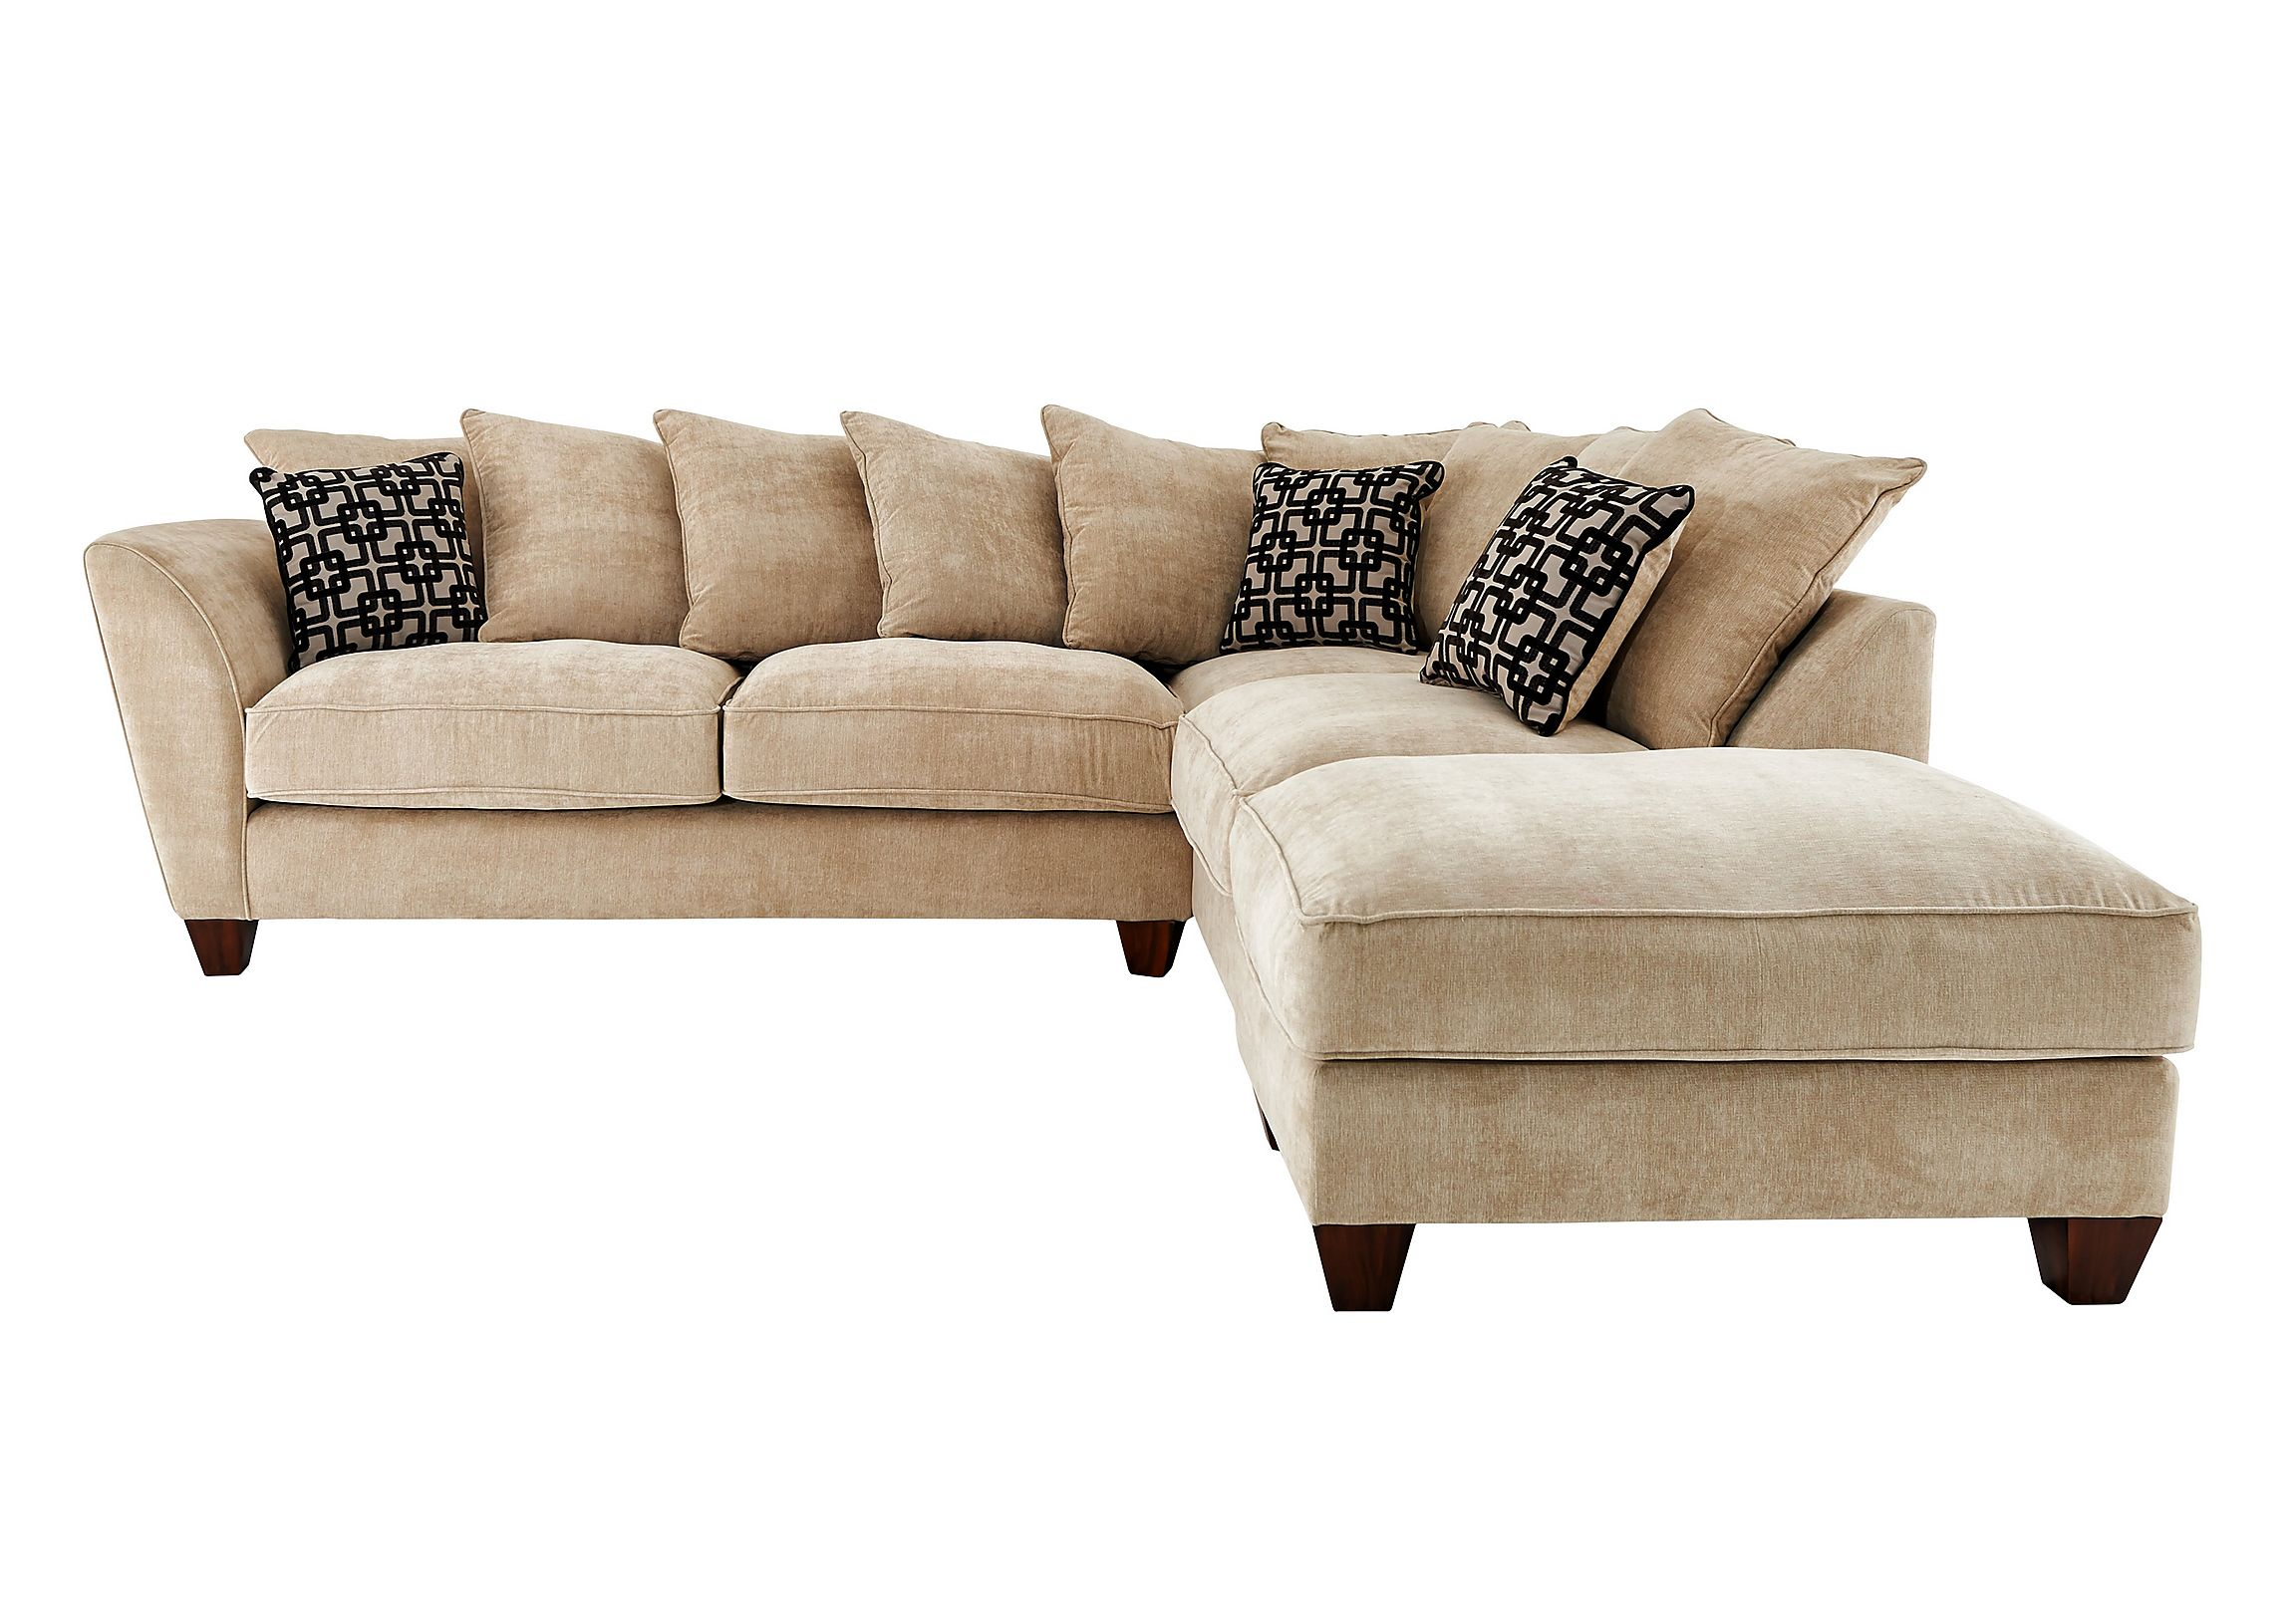 corner recliner sofa northern ireland floral fabric set single bed brokeasshome